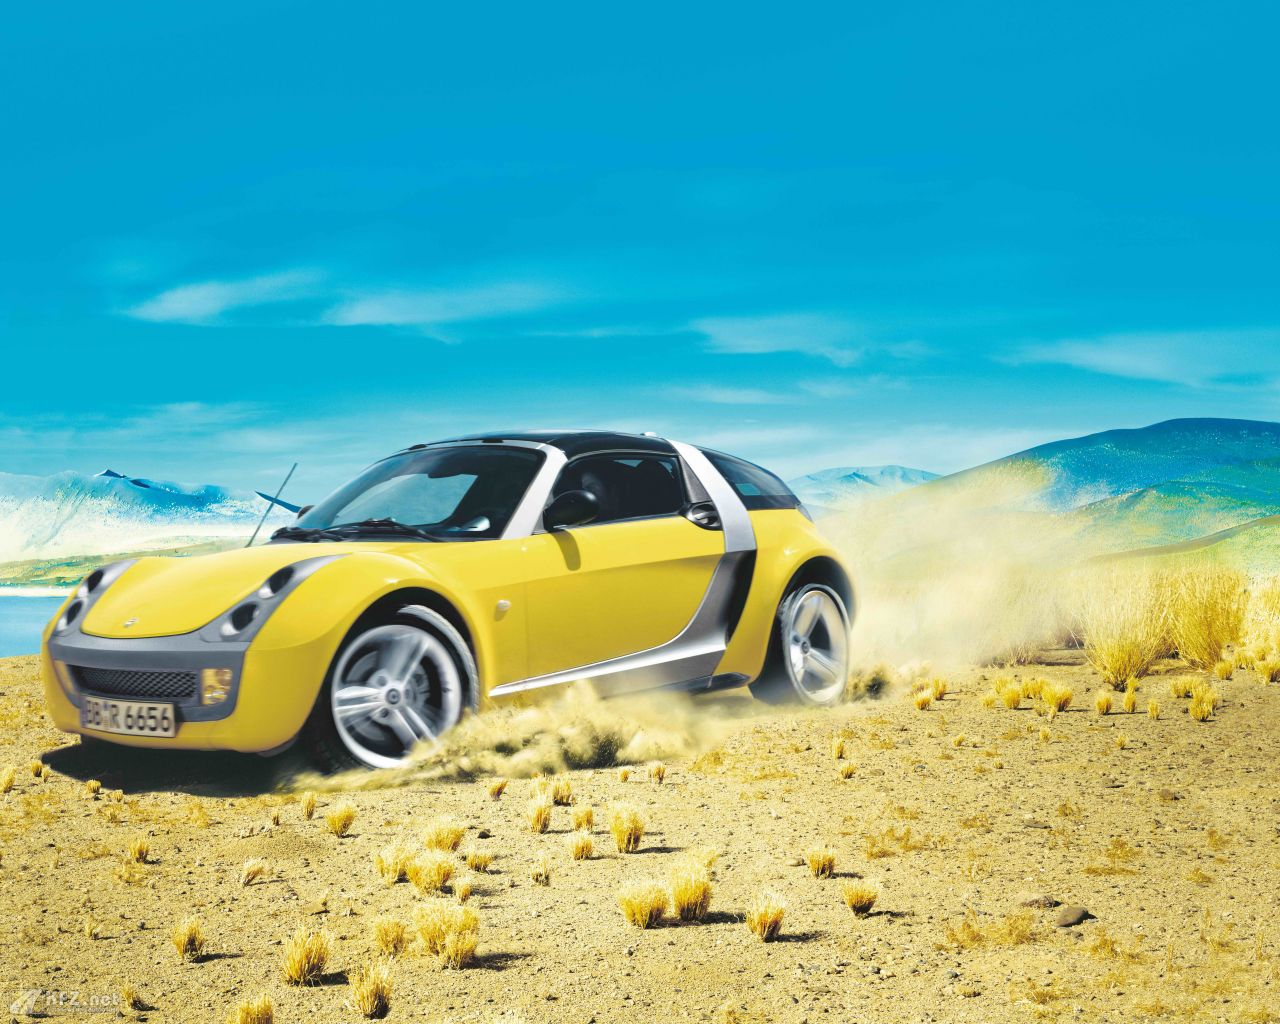 smart-roadster-1280x1024-2